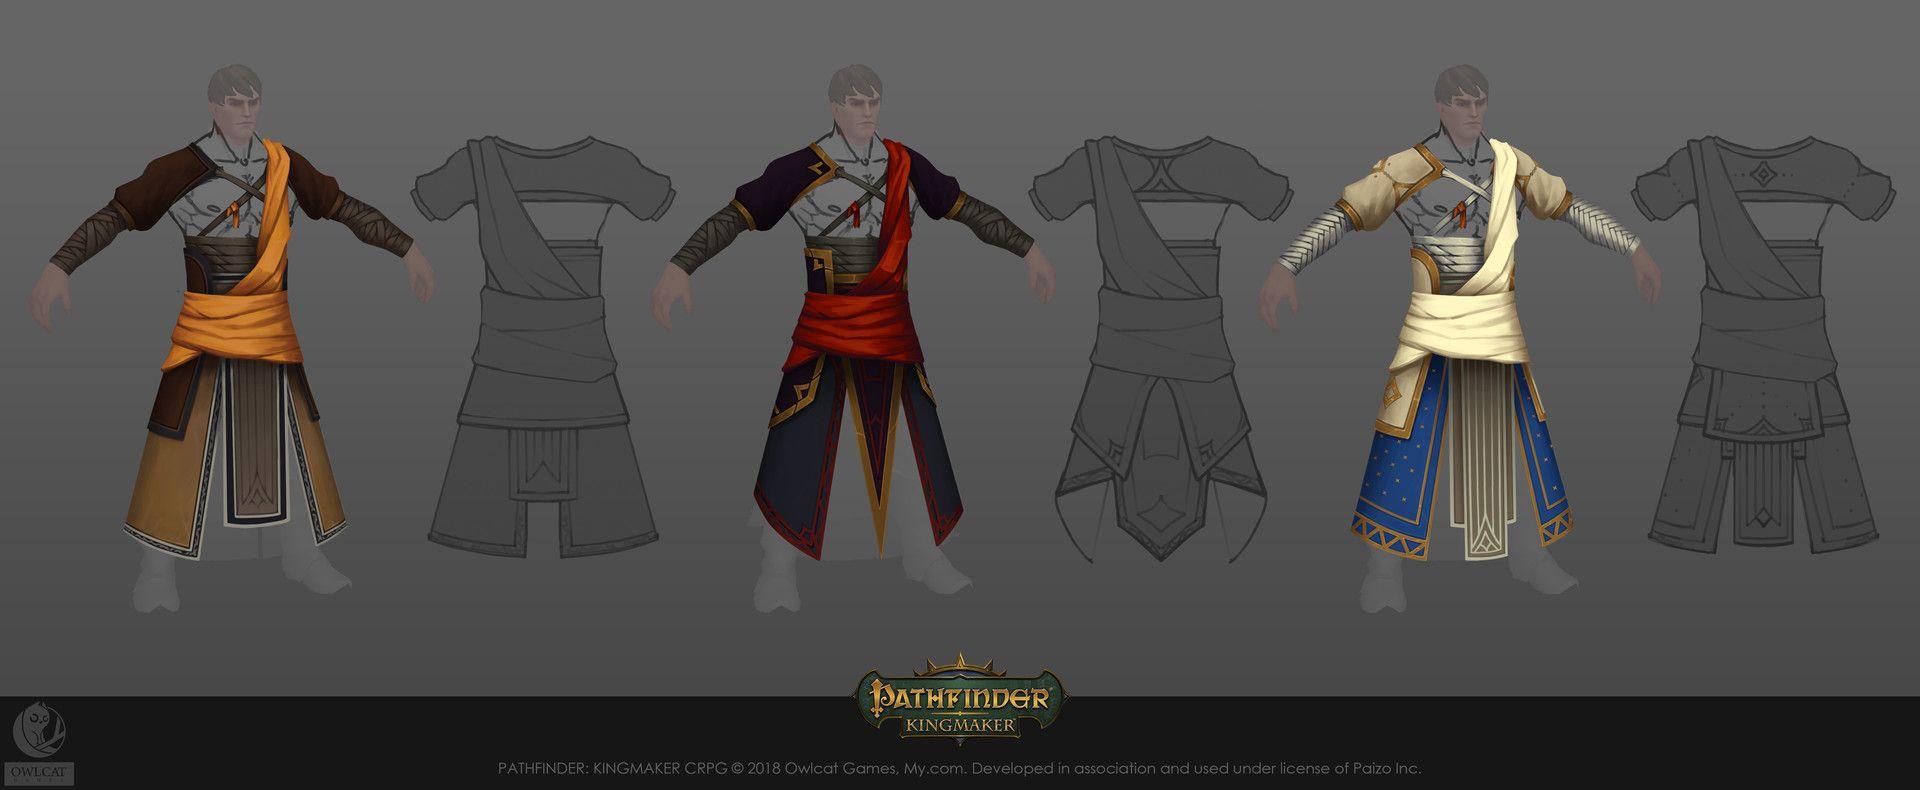 ArtStation - Pathfinder: Kingmaker, Vasiliy Vlasov | Weapon